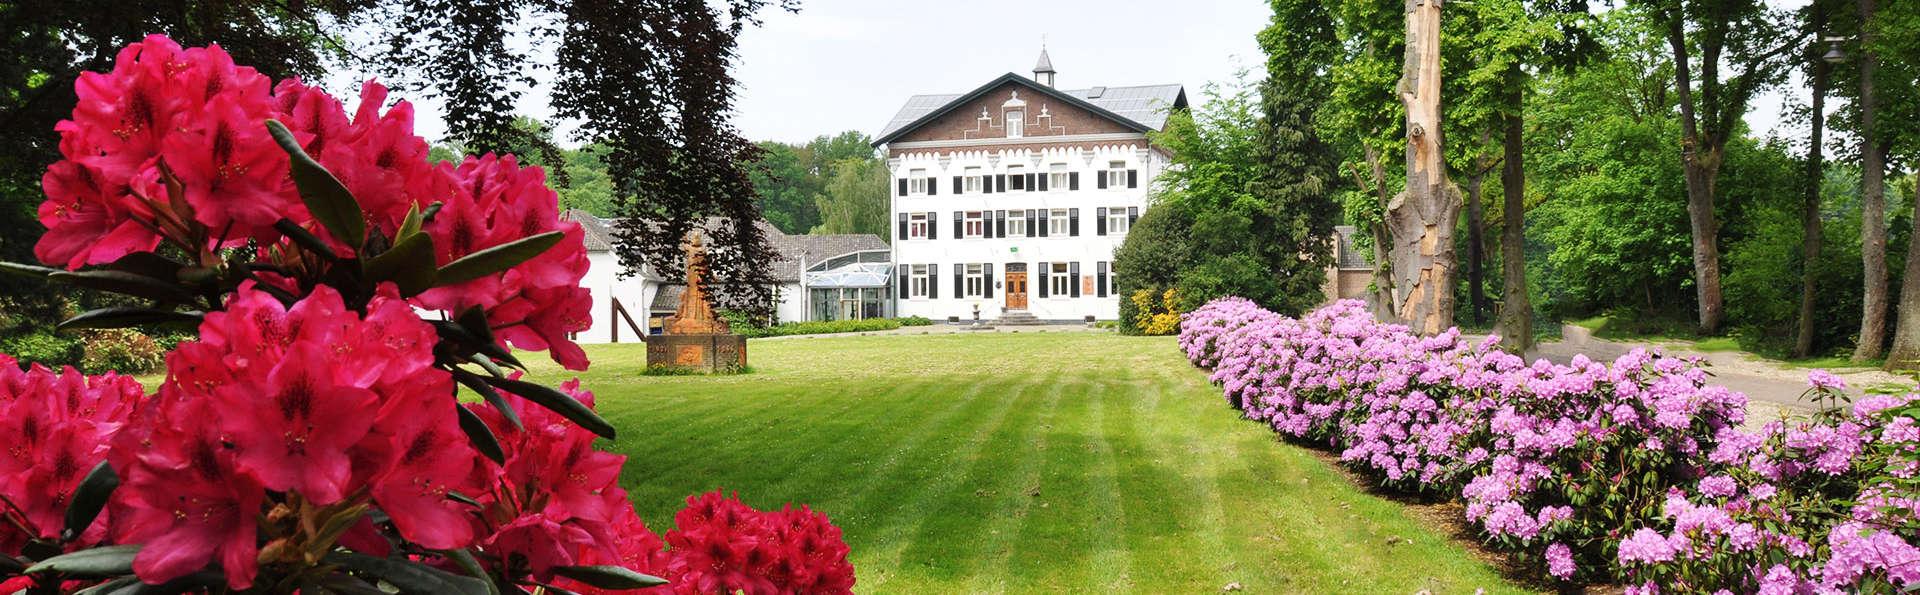 Pillows Charme Hotel Château de Raay Limburg  - EDIT_front1.jpg